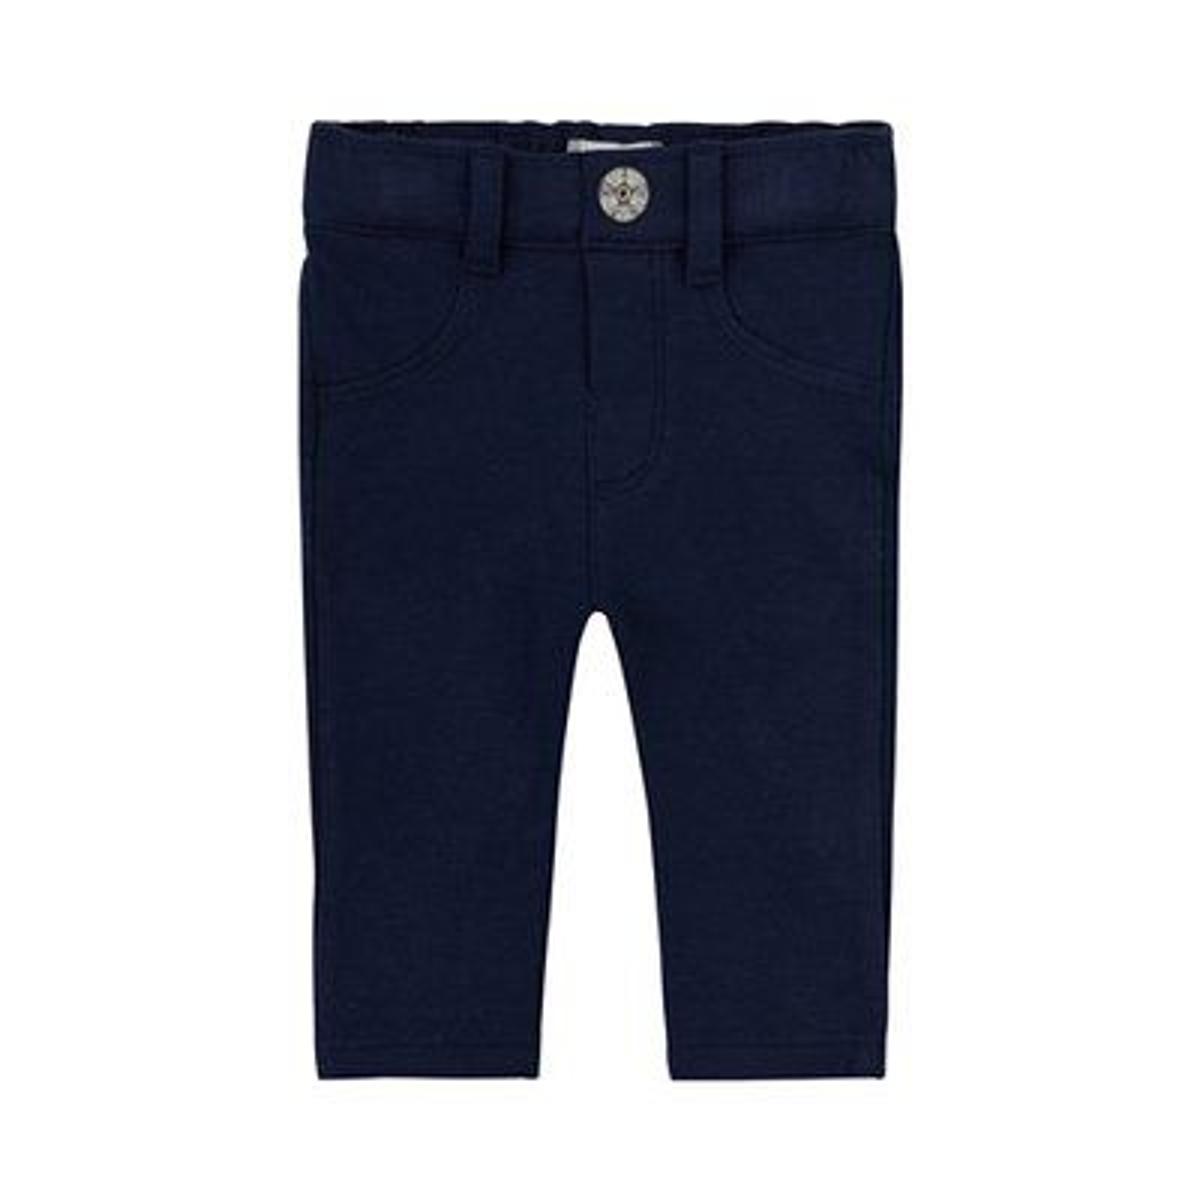 SANETTA Le pantalon pantalon bébé